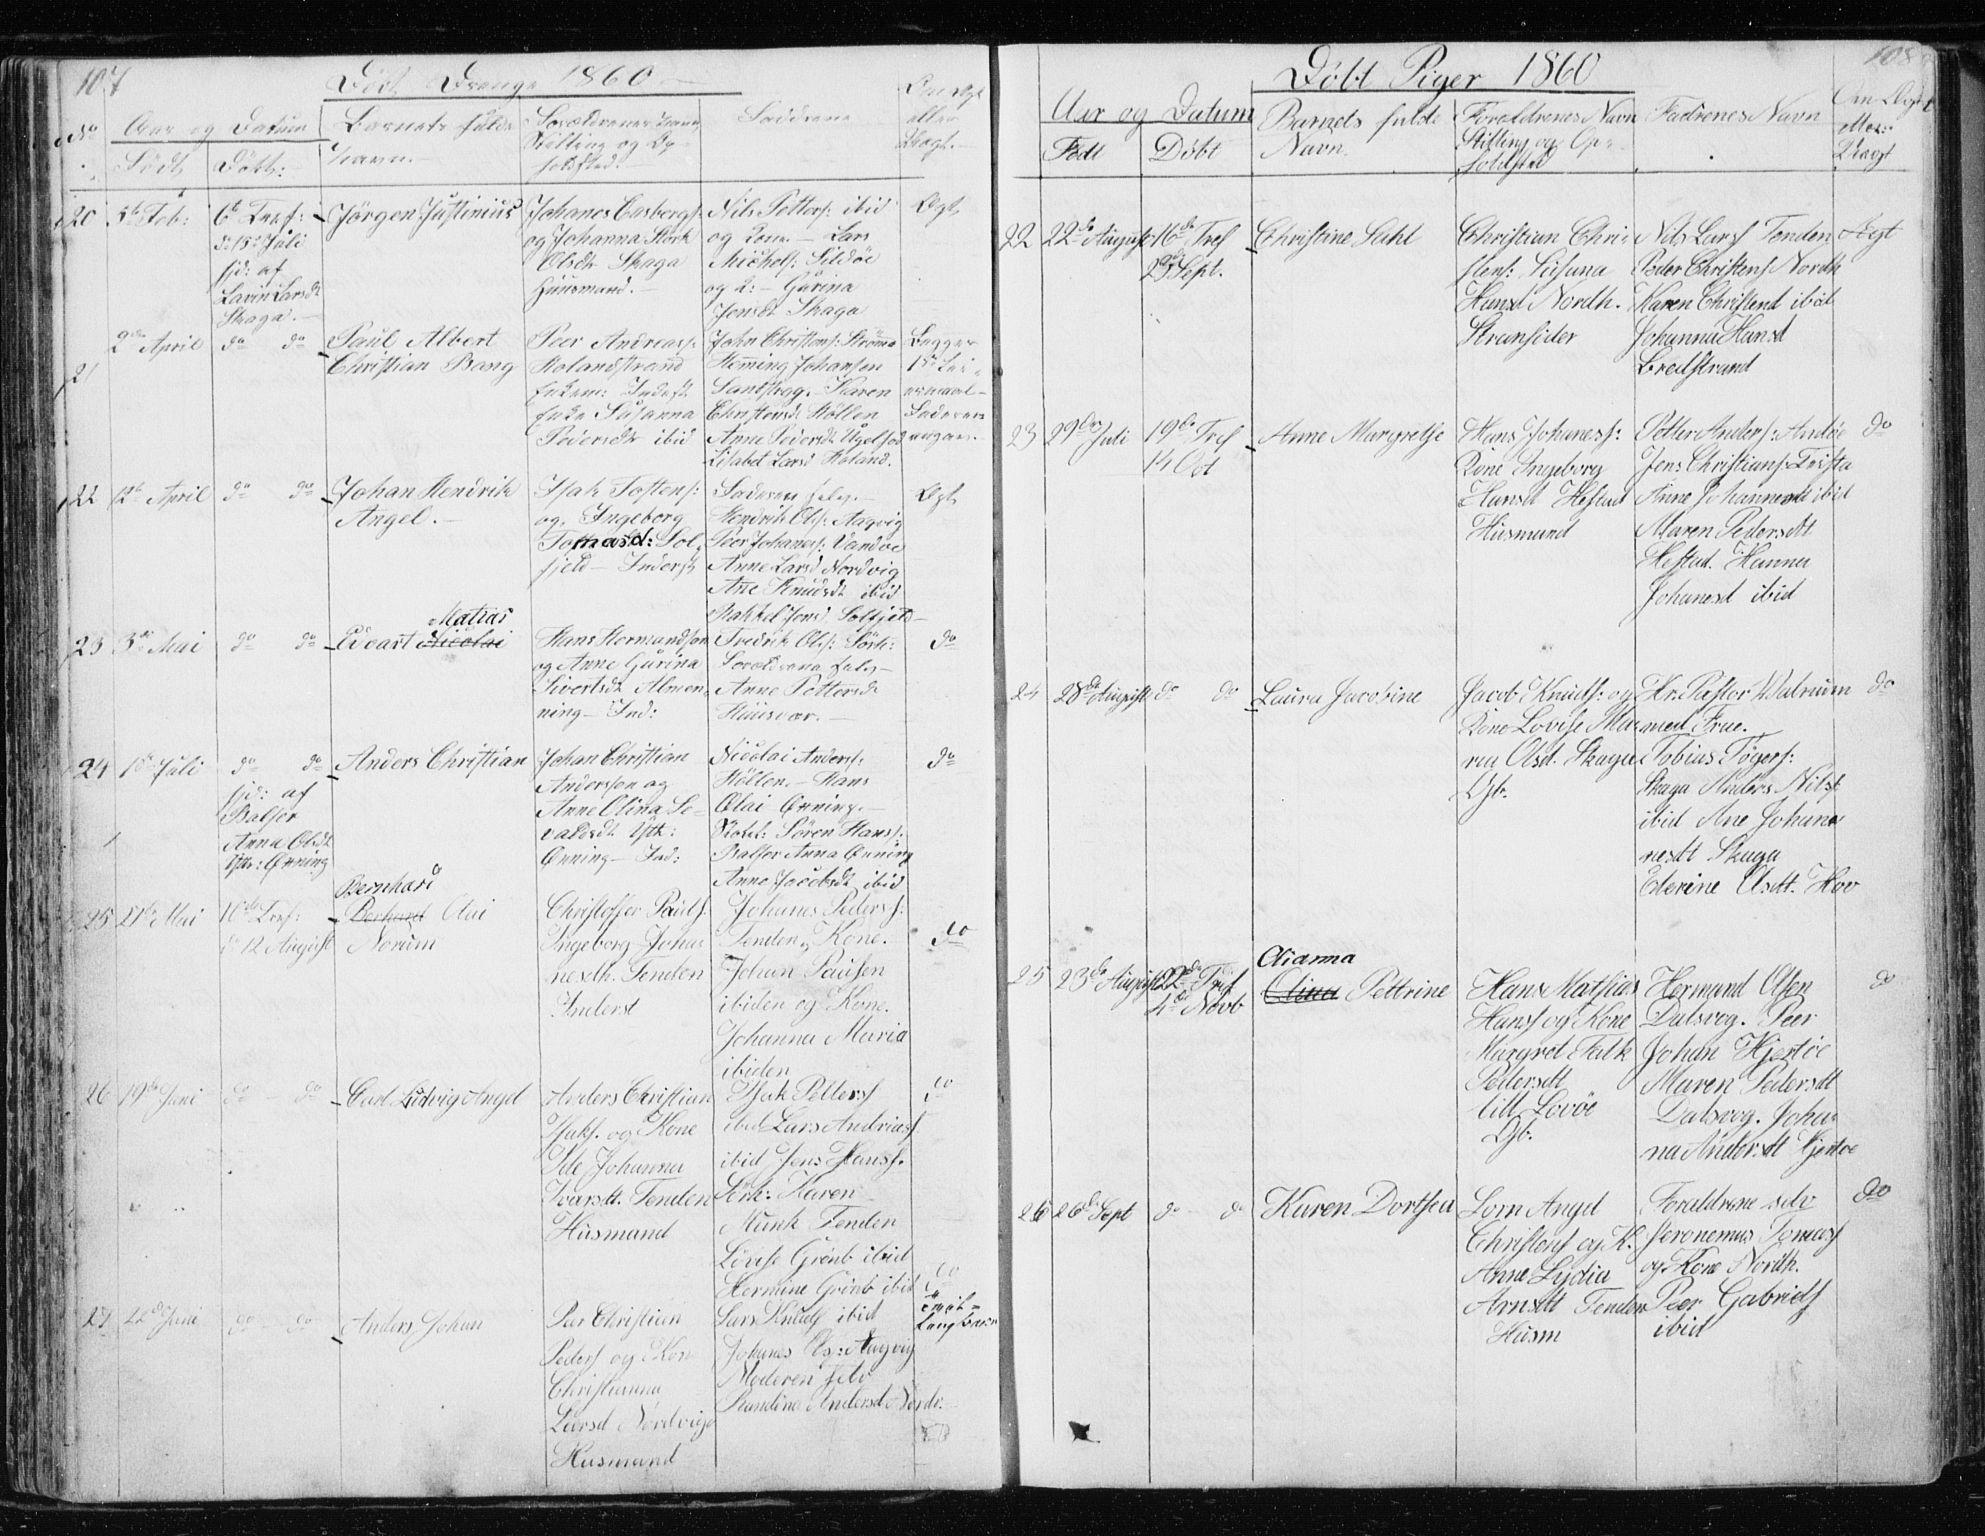 SAT, Ministerialprotokoller, klokkerbøker og fødselsregistre - Nordland, 834/L0511: Klokkerbok nr. 834C02, 1848-1862, s. 107-108